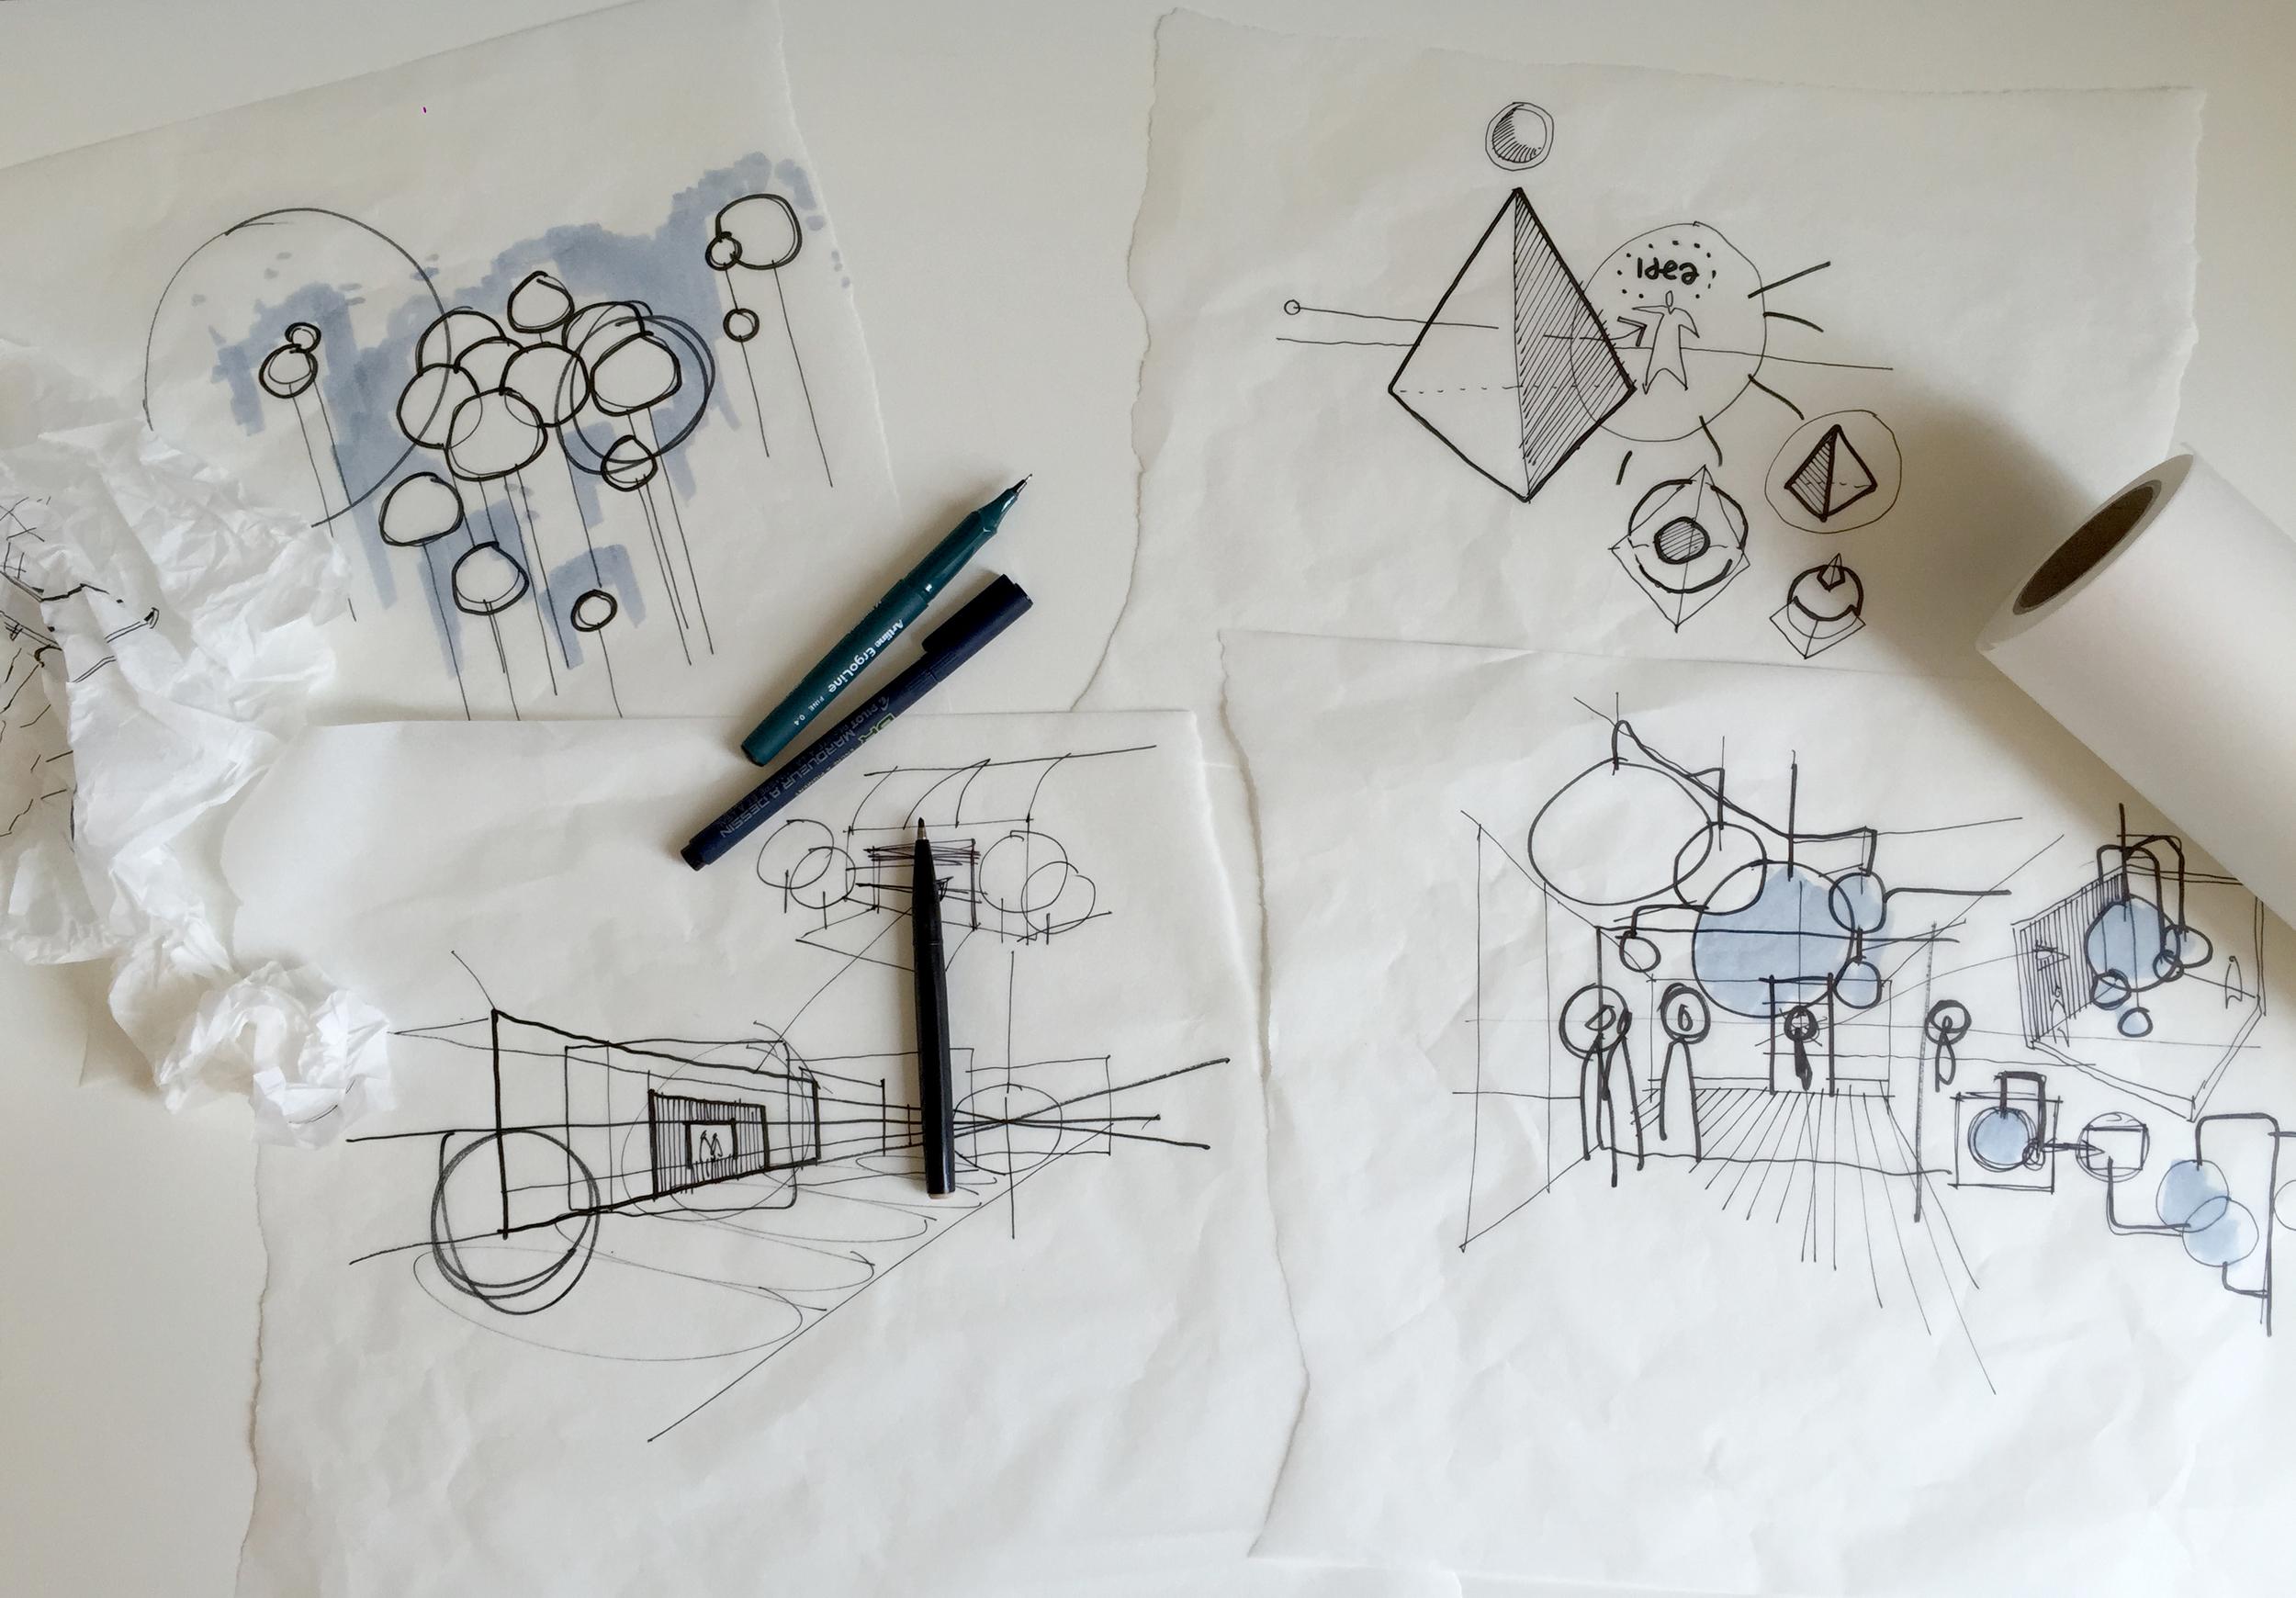 rca sketch.jpg